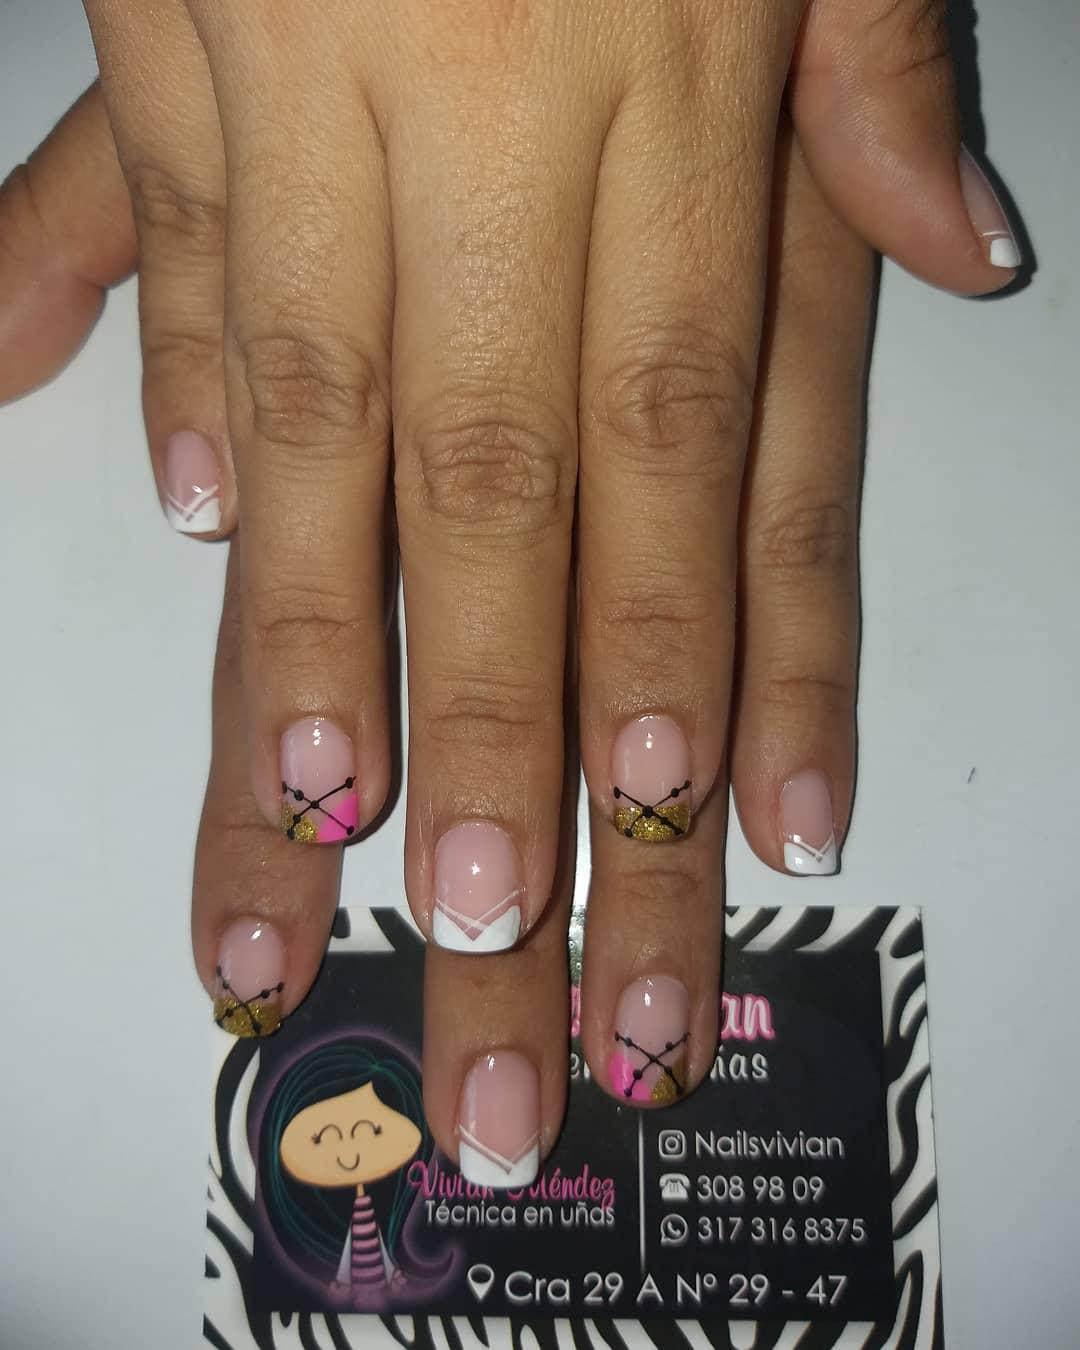 # manicureniñasfelices #manicurarusa #masglovirginal #masglorebelde #manicure # u ...